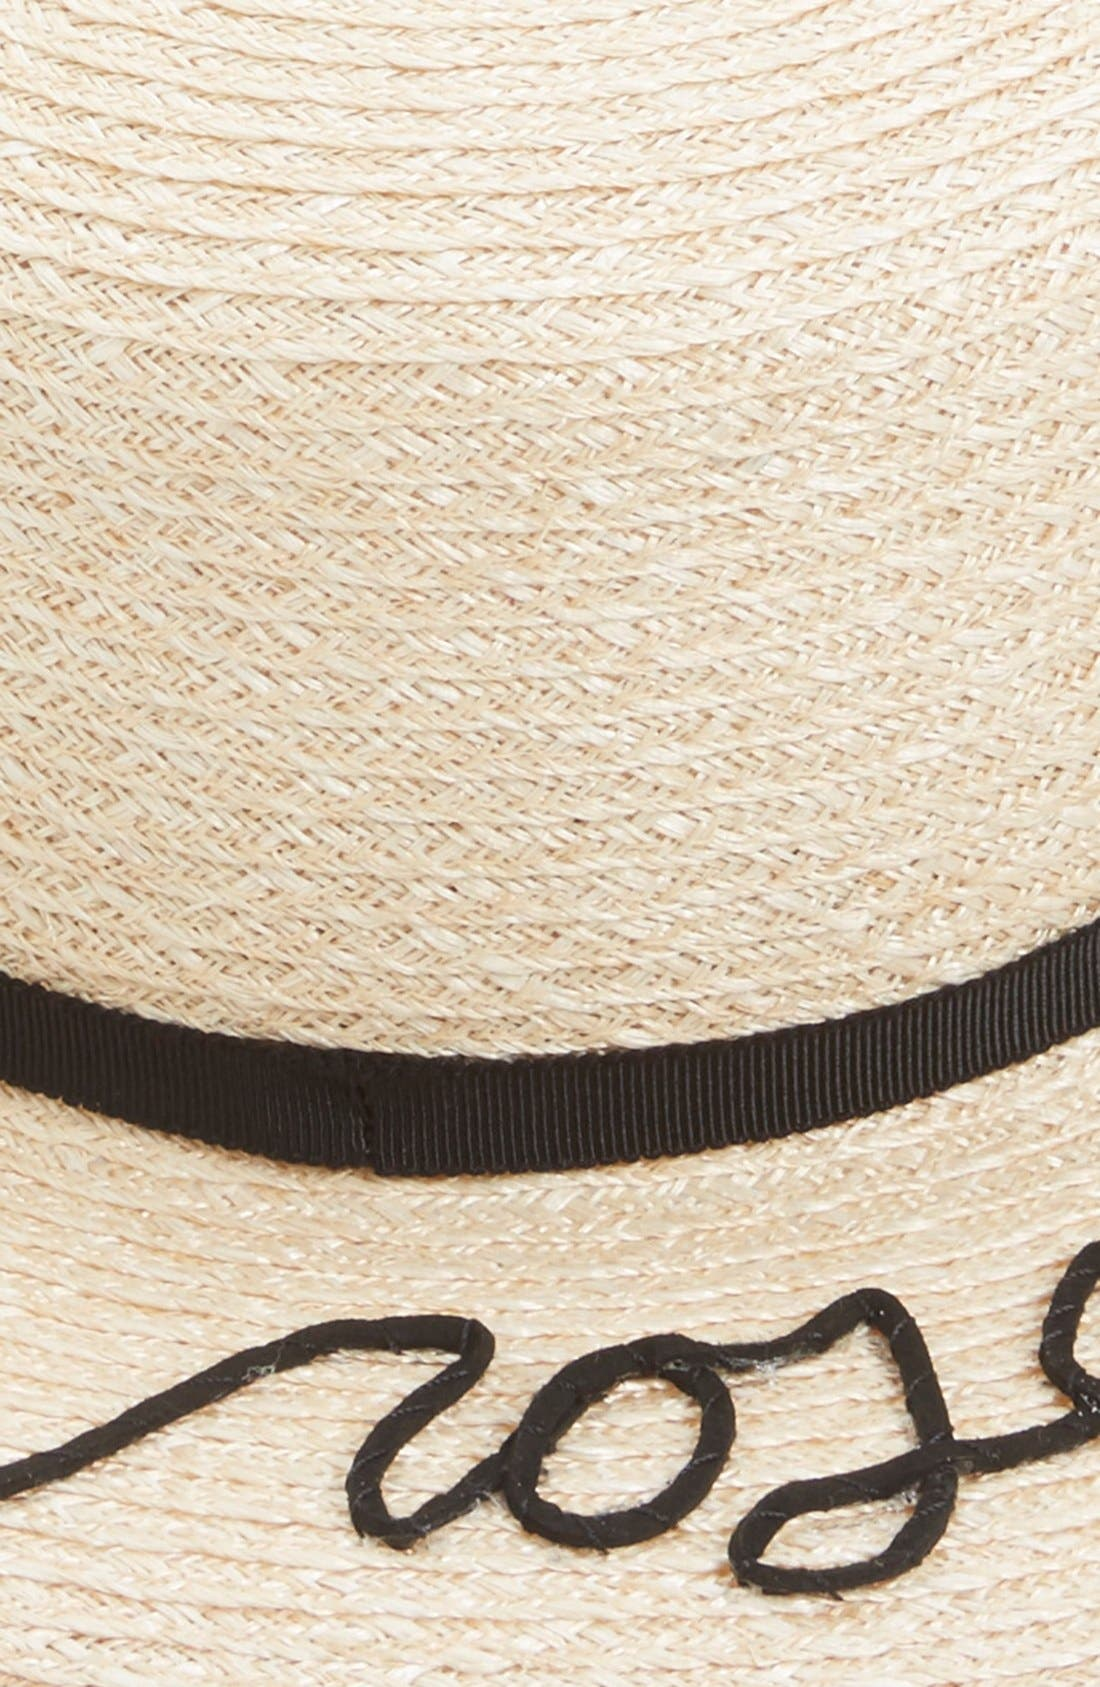 'Brigitte - A Rose is a Rose is a Rose' Hemp & Cotton Boater Hat,                             Alternate thumbnail 2, color,                             250